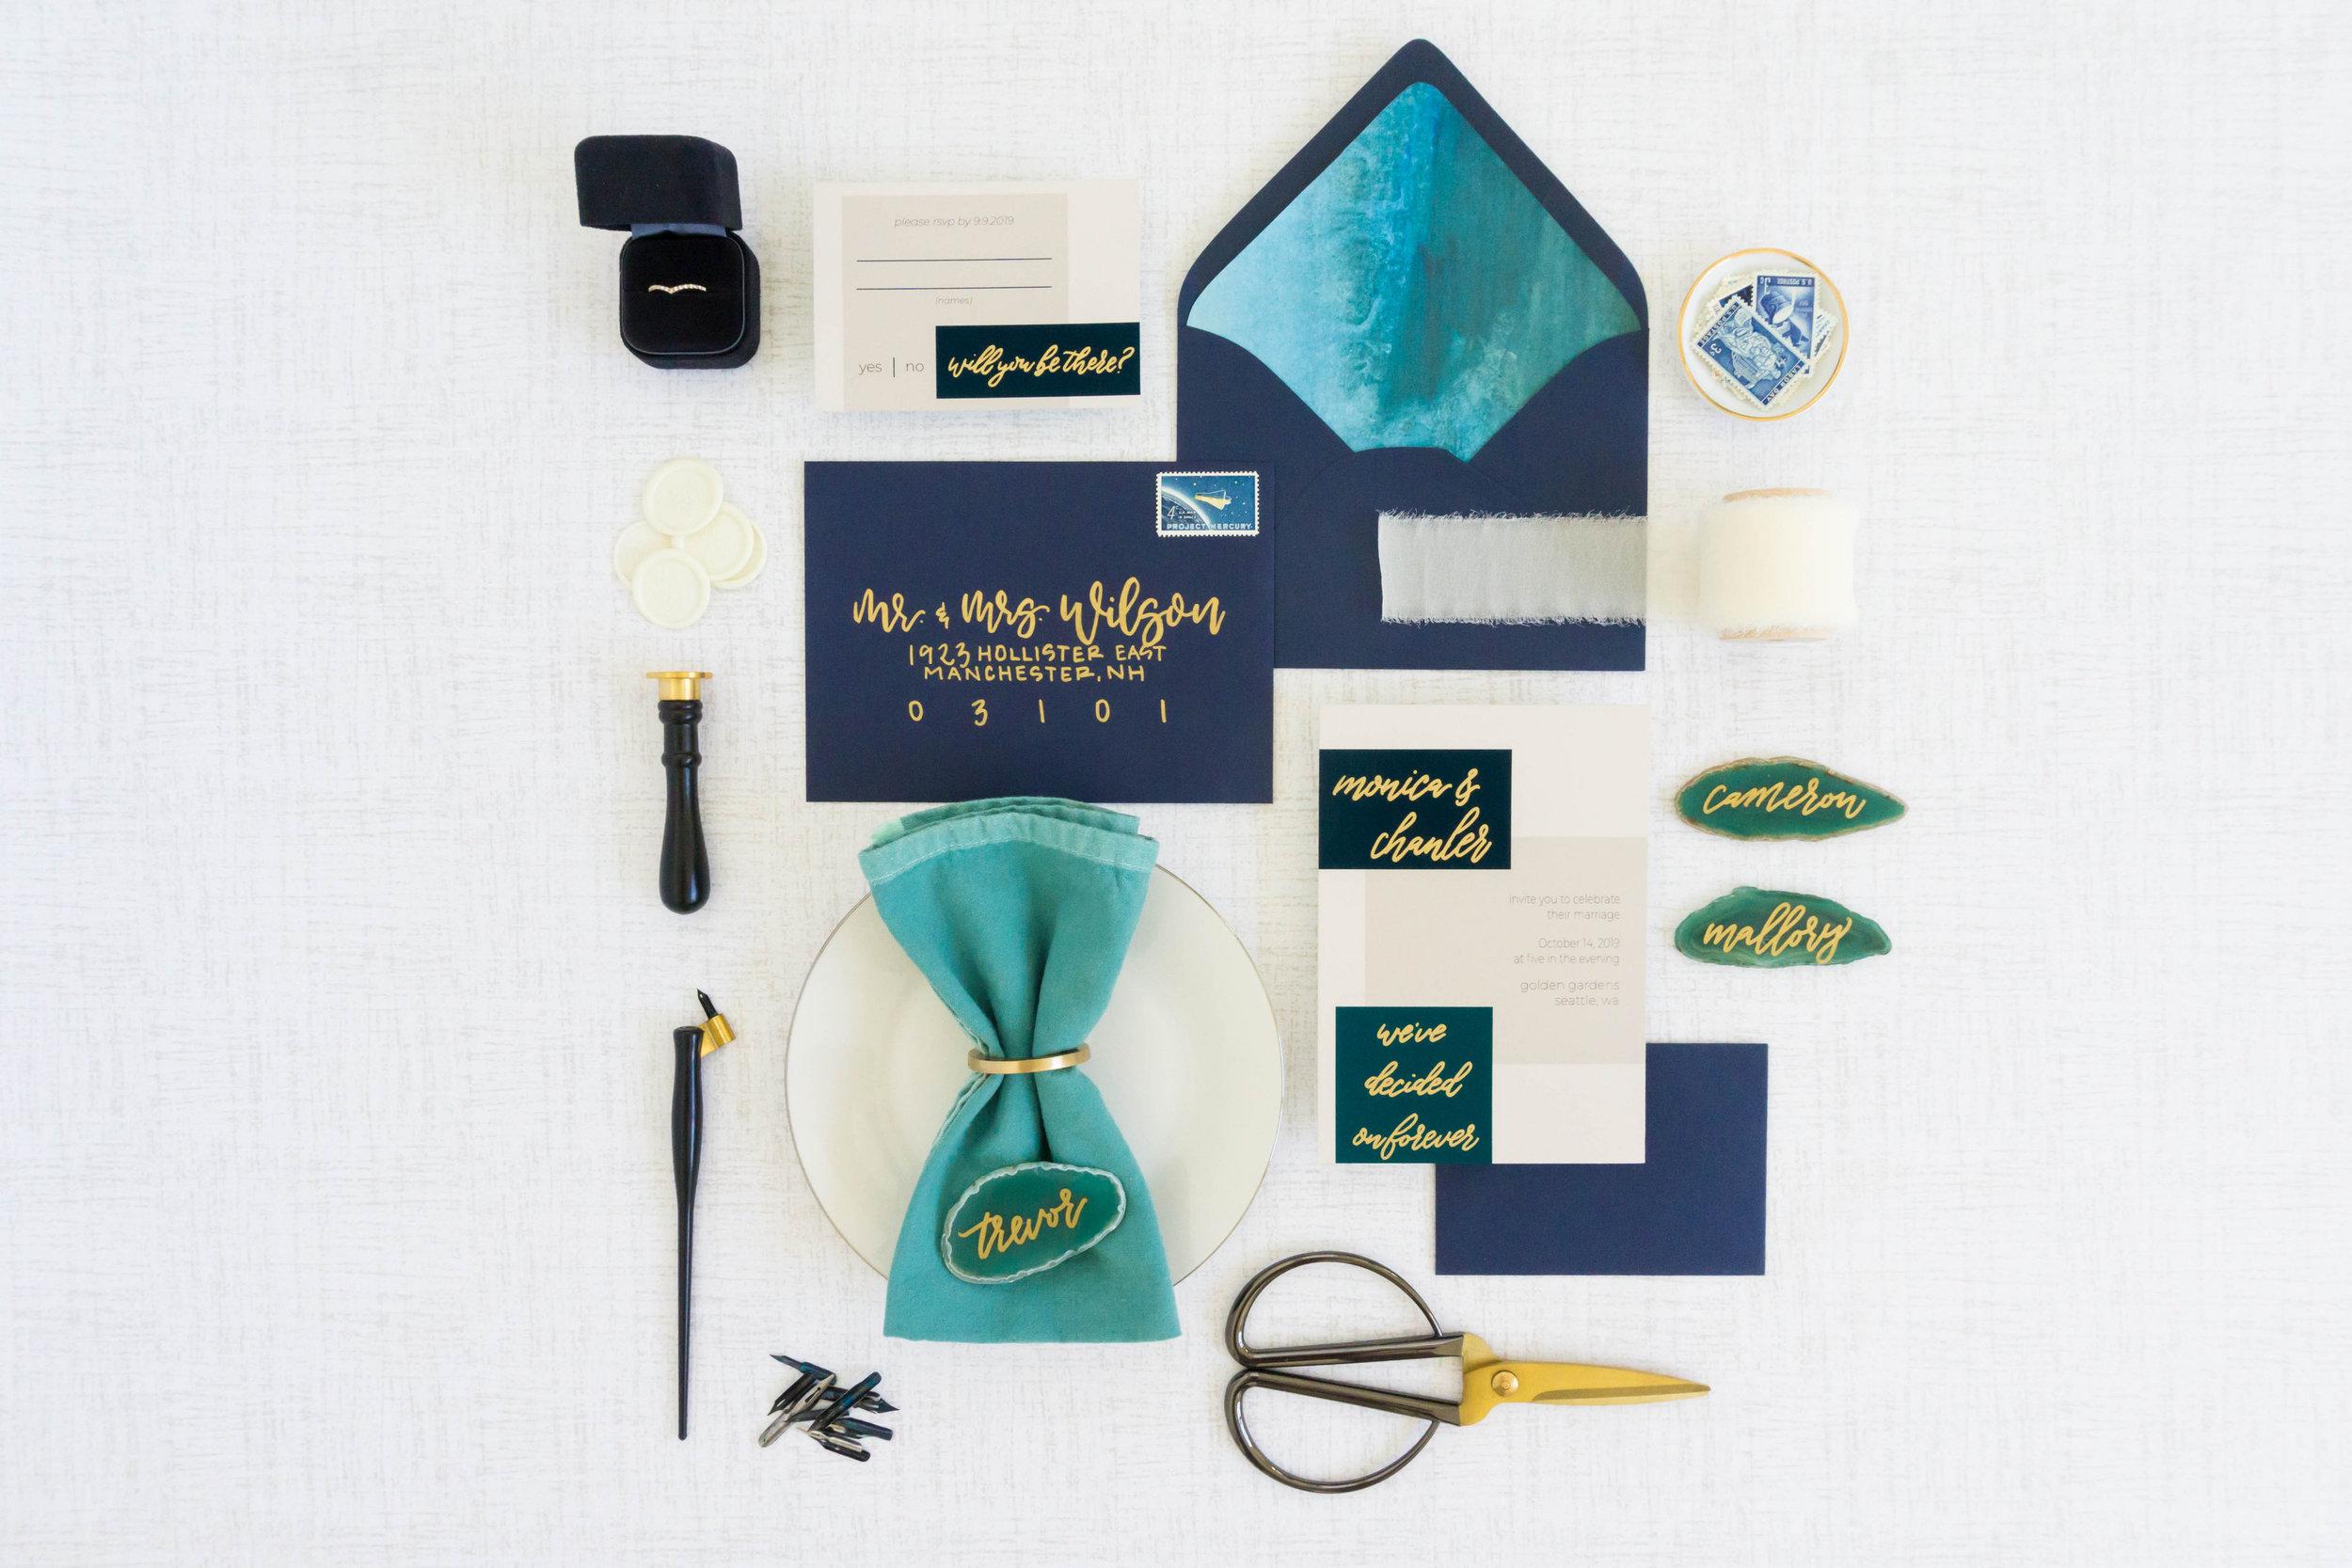 love-fern-design-studio-custom-wedding-invitations-for-the-modern-couple-modern-calligraphy-in-seattle-washington-custom-wedding-stationery-navy-gold-teal-modern-color-block-invitation-suite